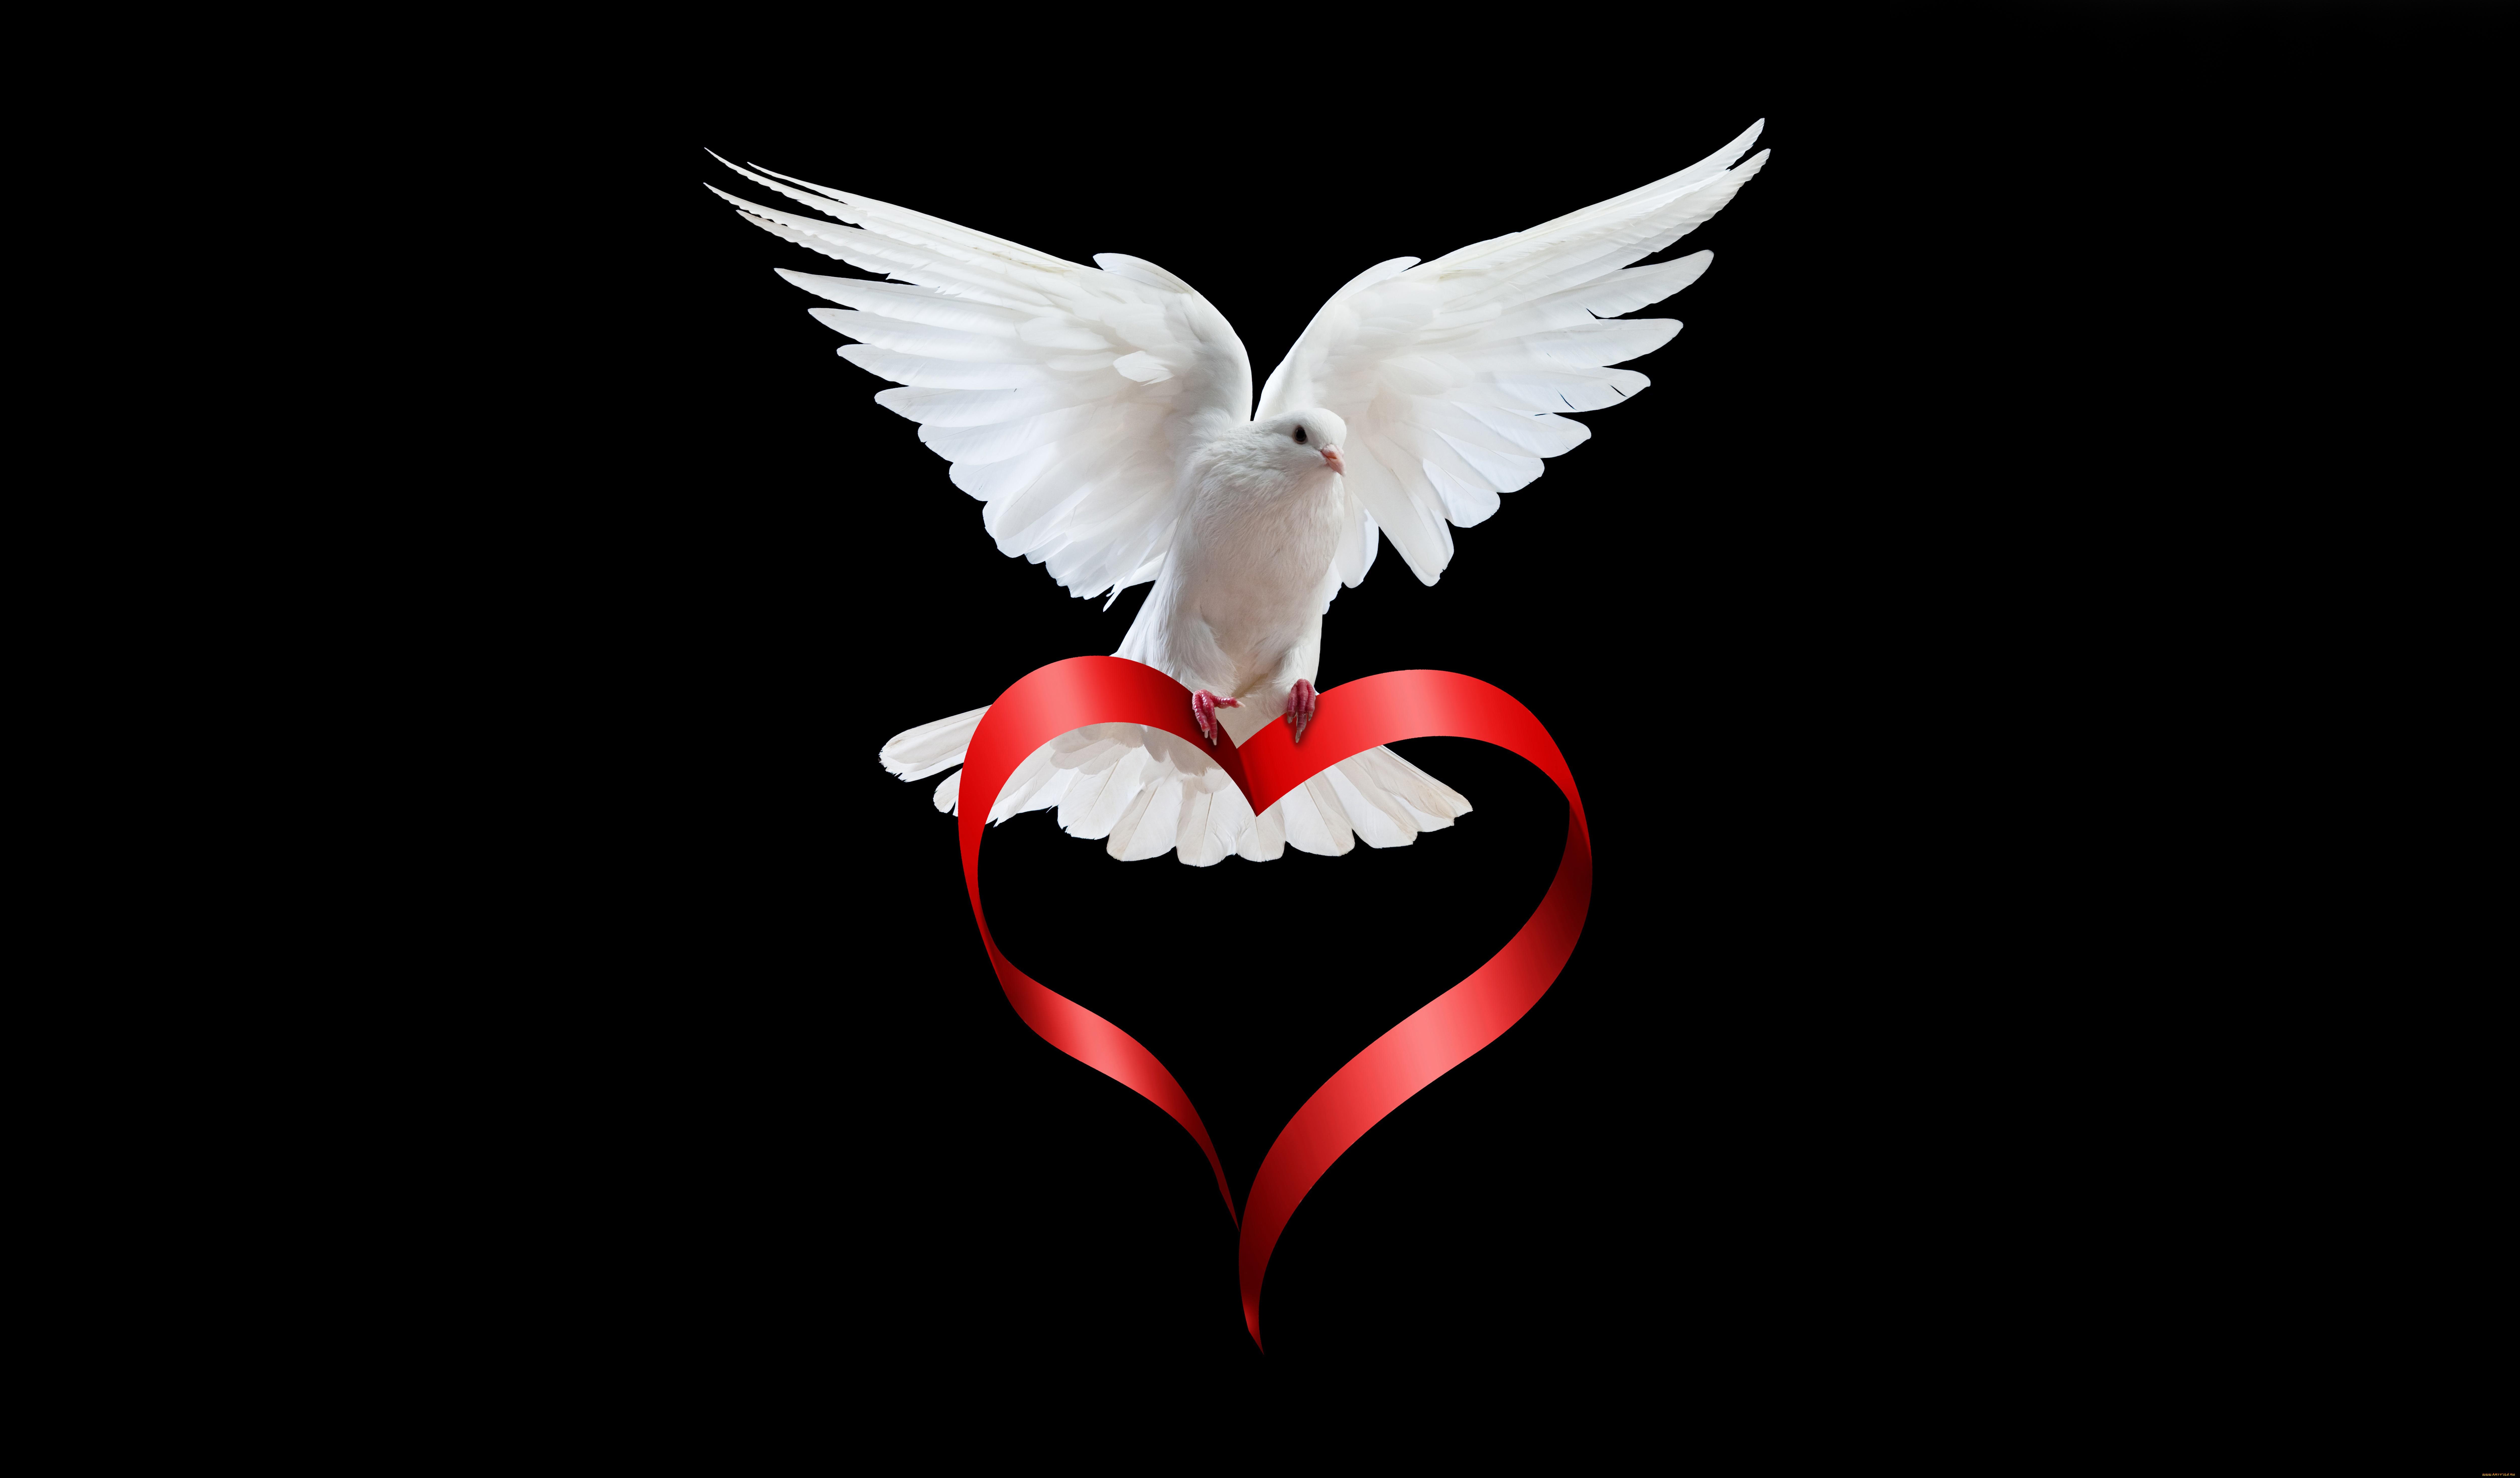 pigeon love story 1574939688 - Pigeon Love Story -